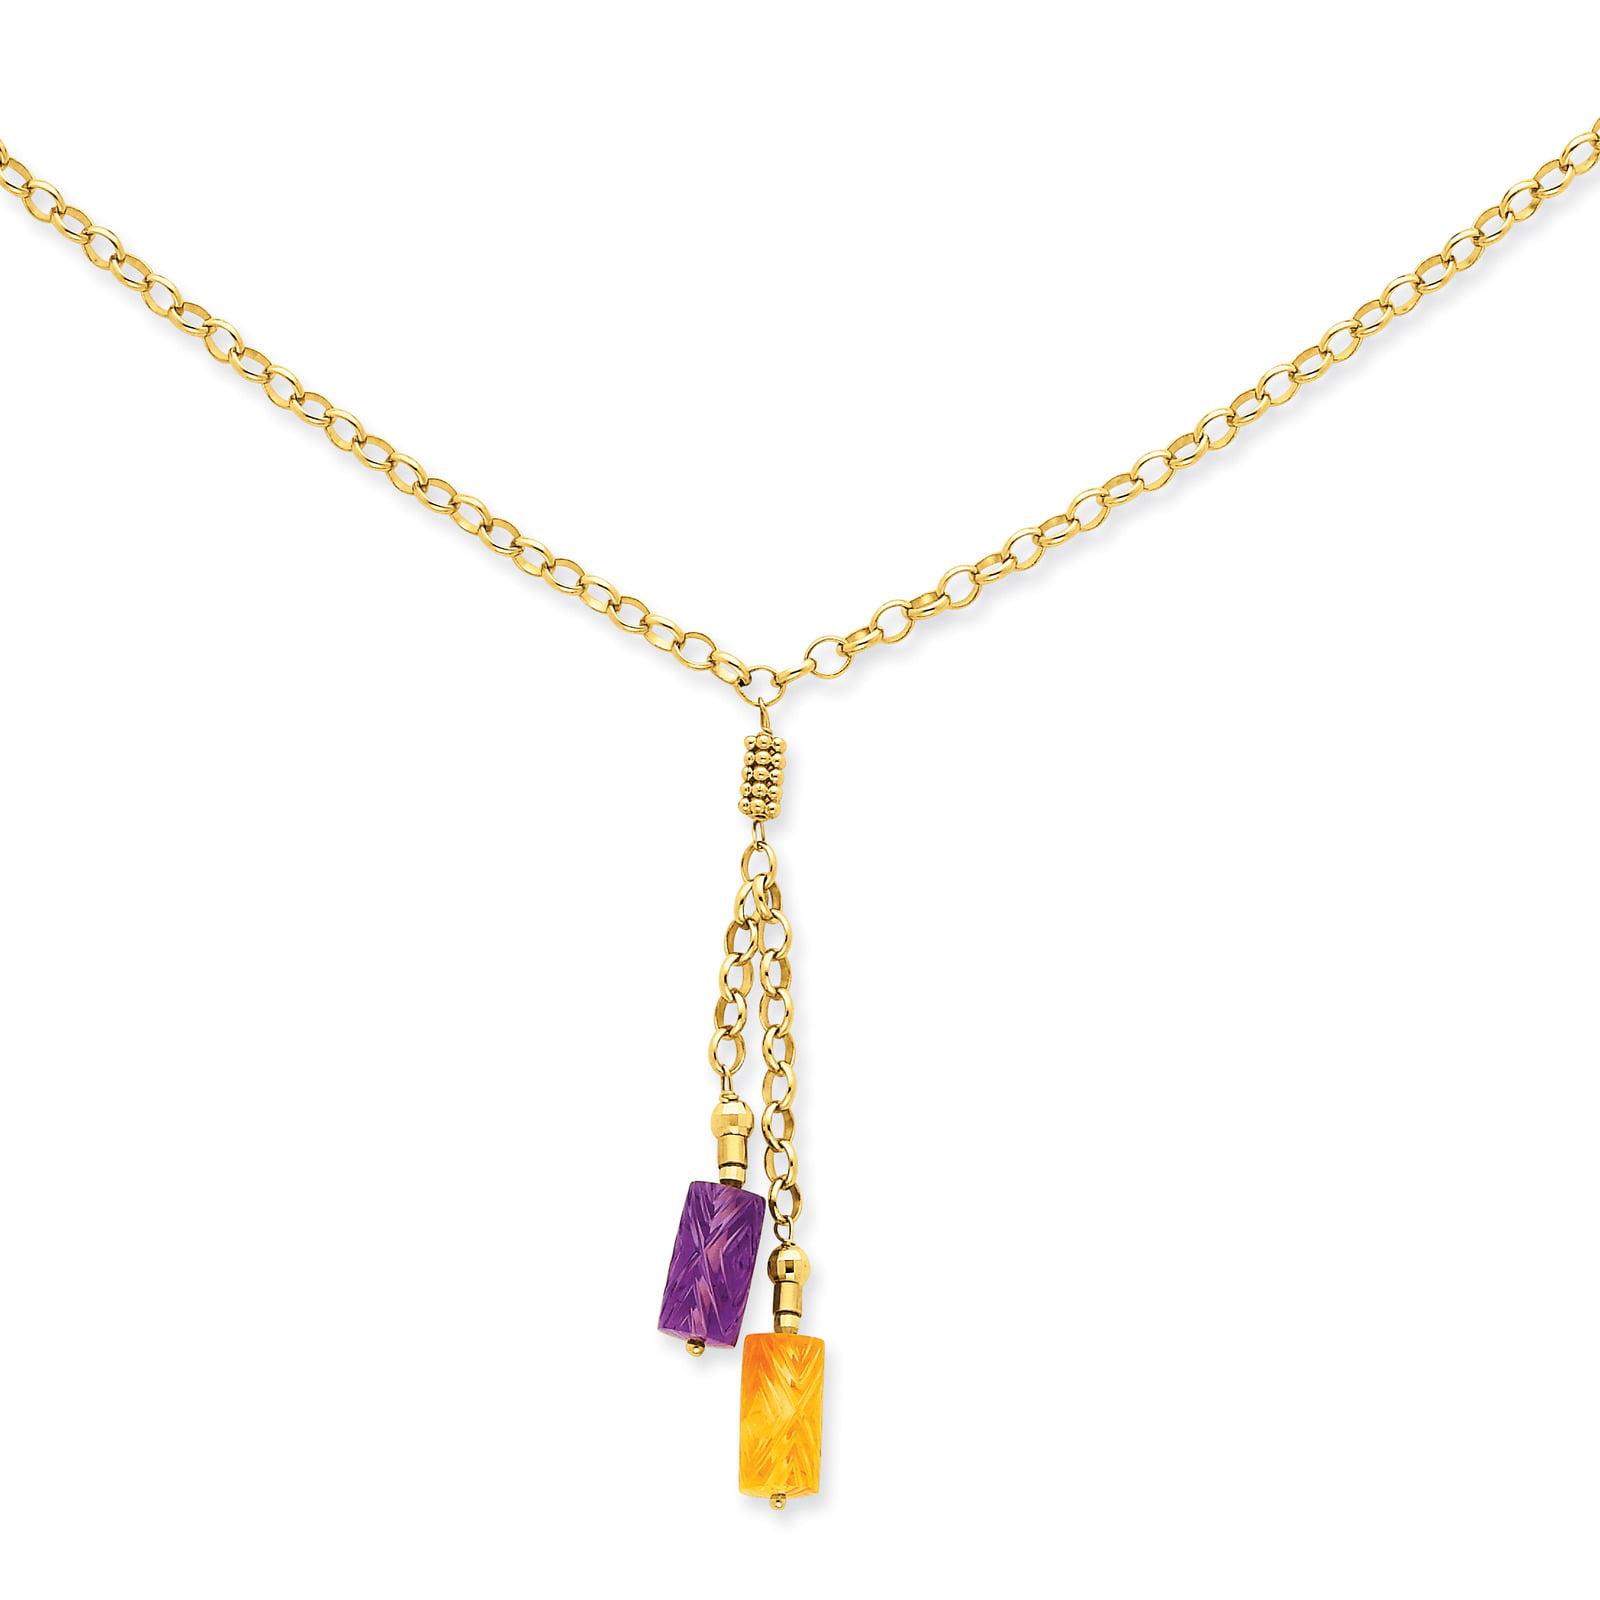 14K Amethyst & Citrine Drop Necklace by